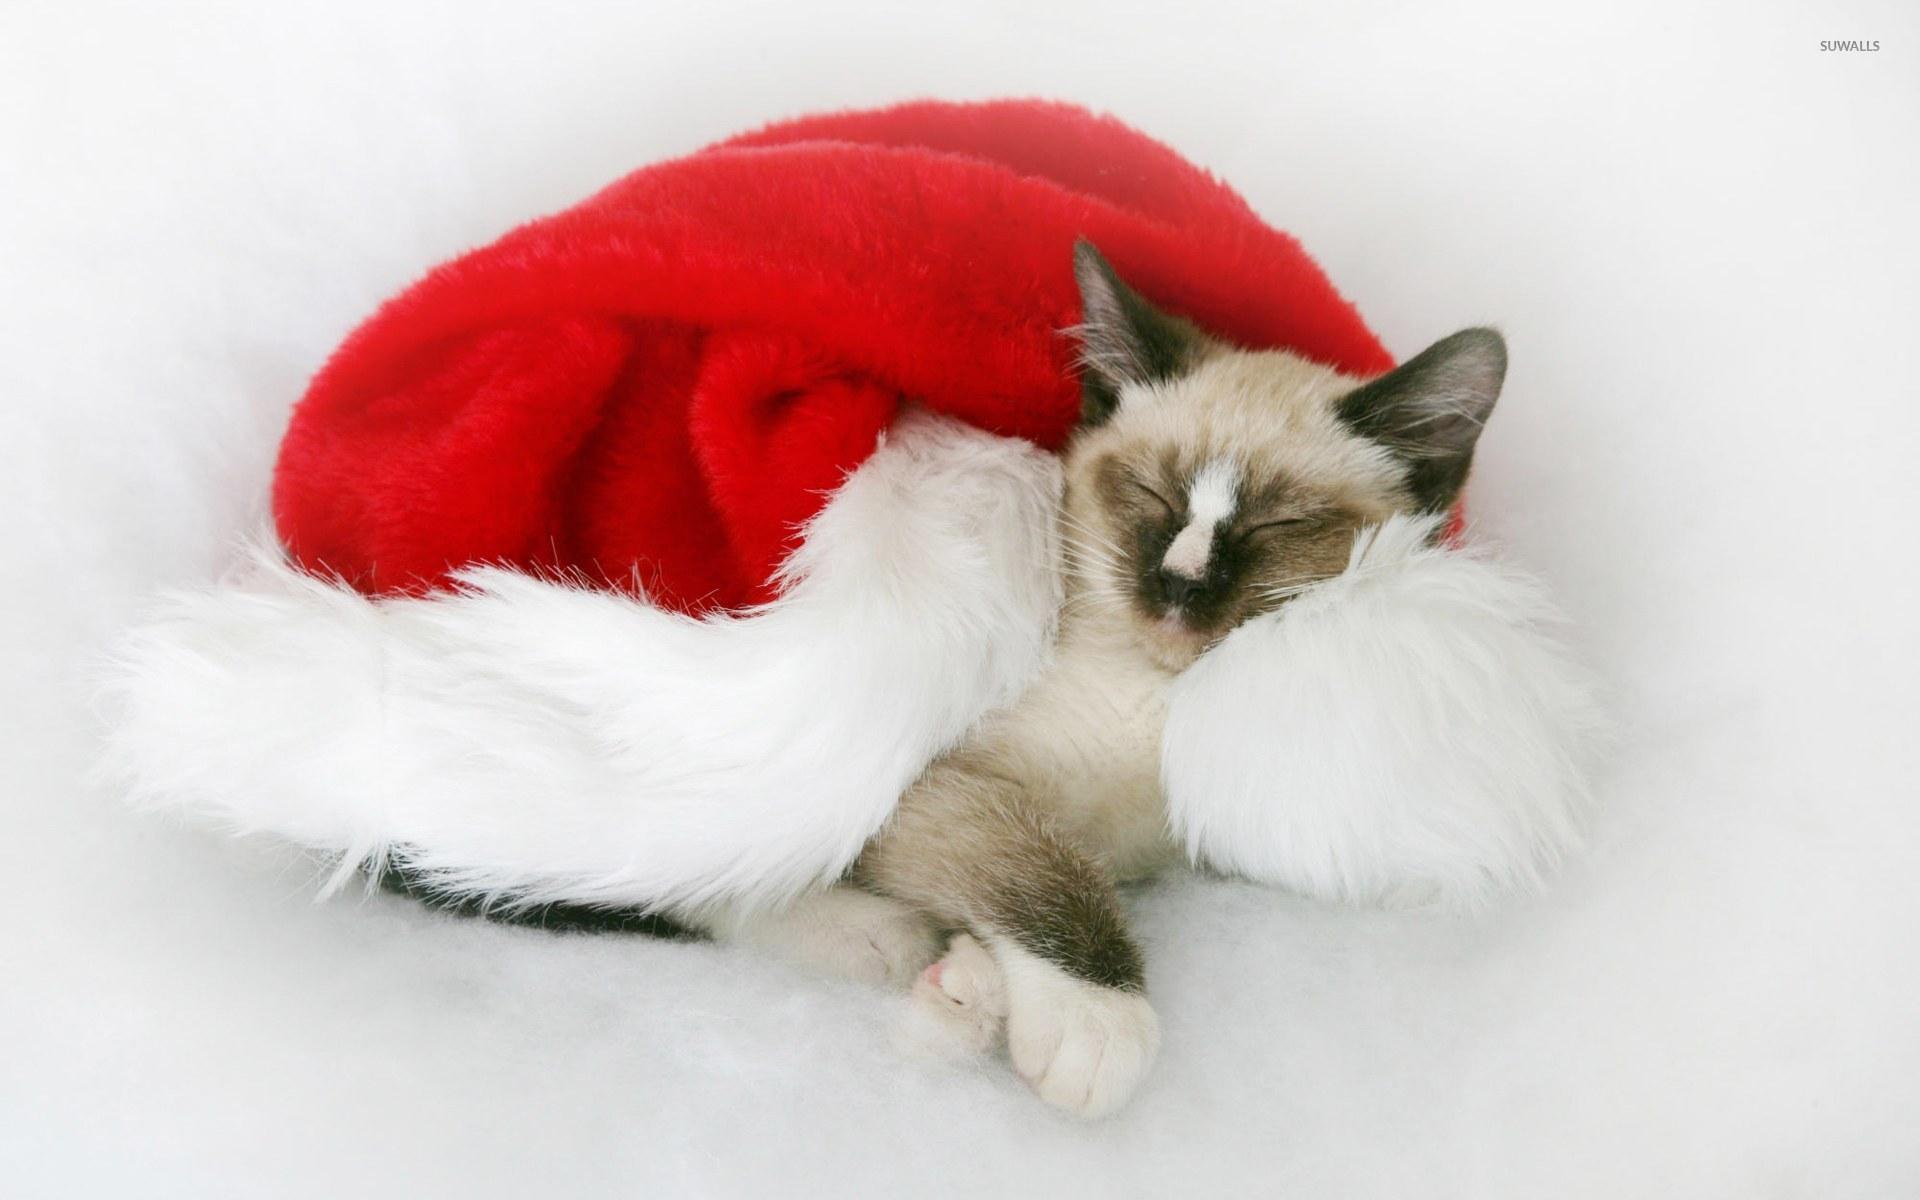 Christmas kitten wallpaper - Animal wallpapers - #9981